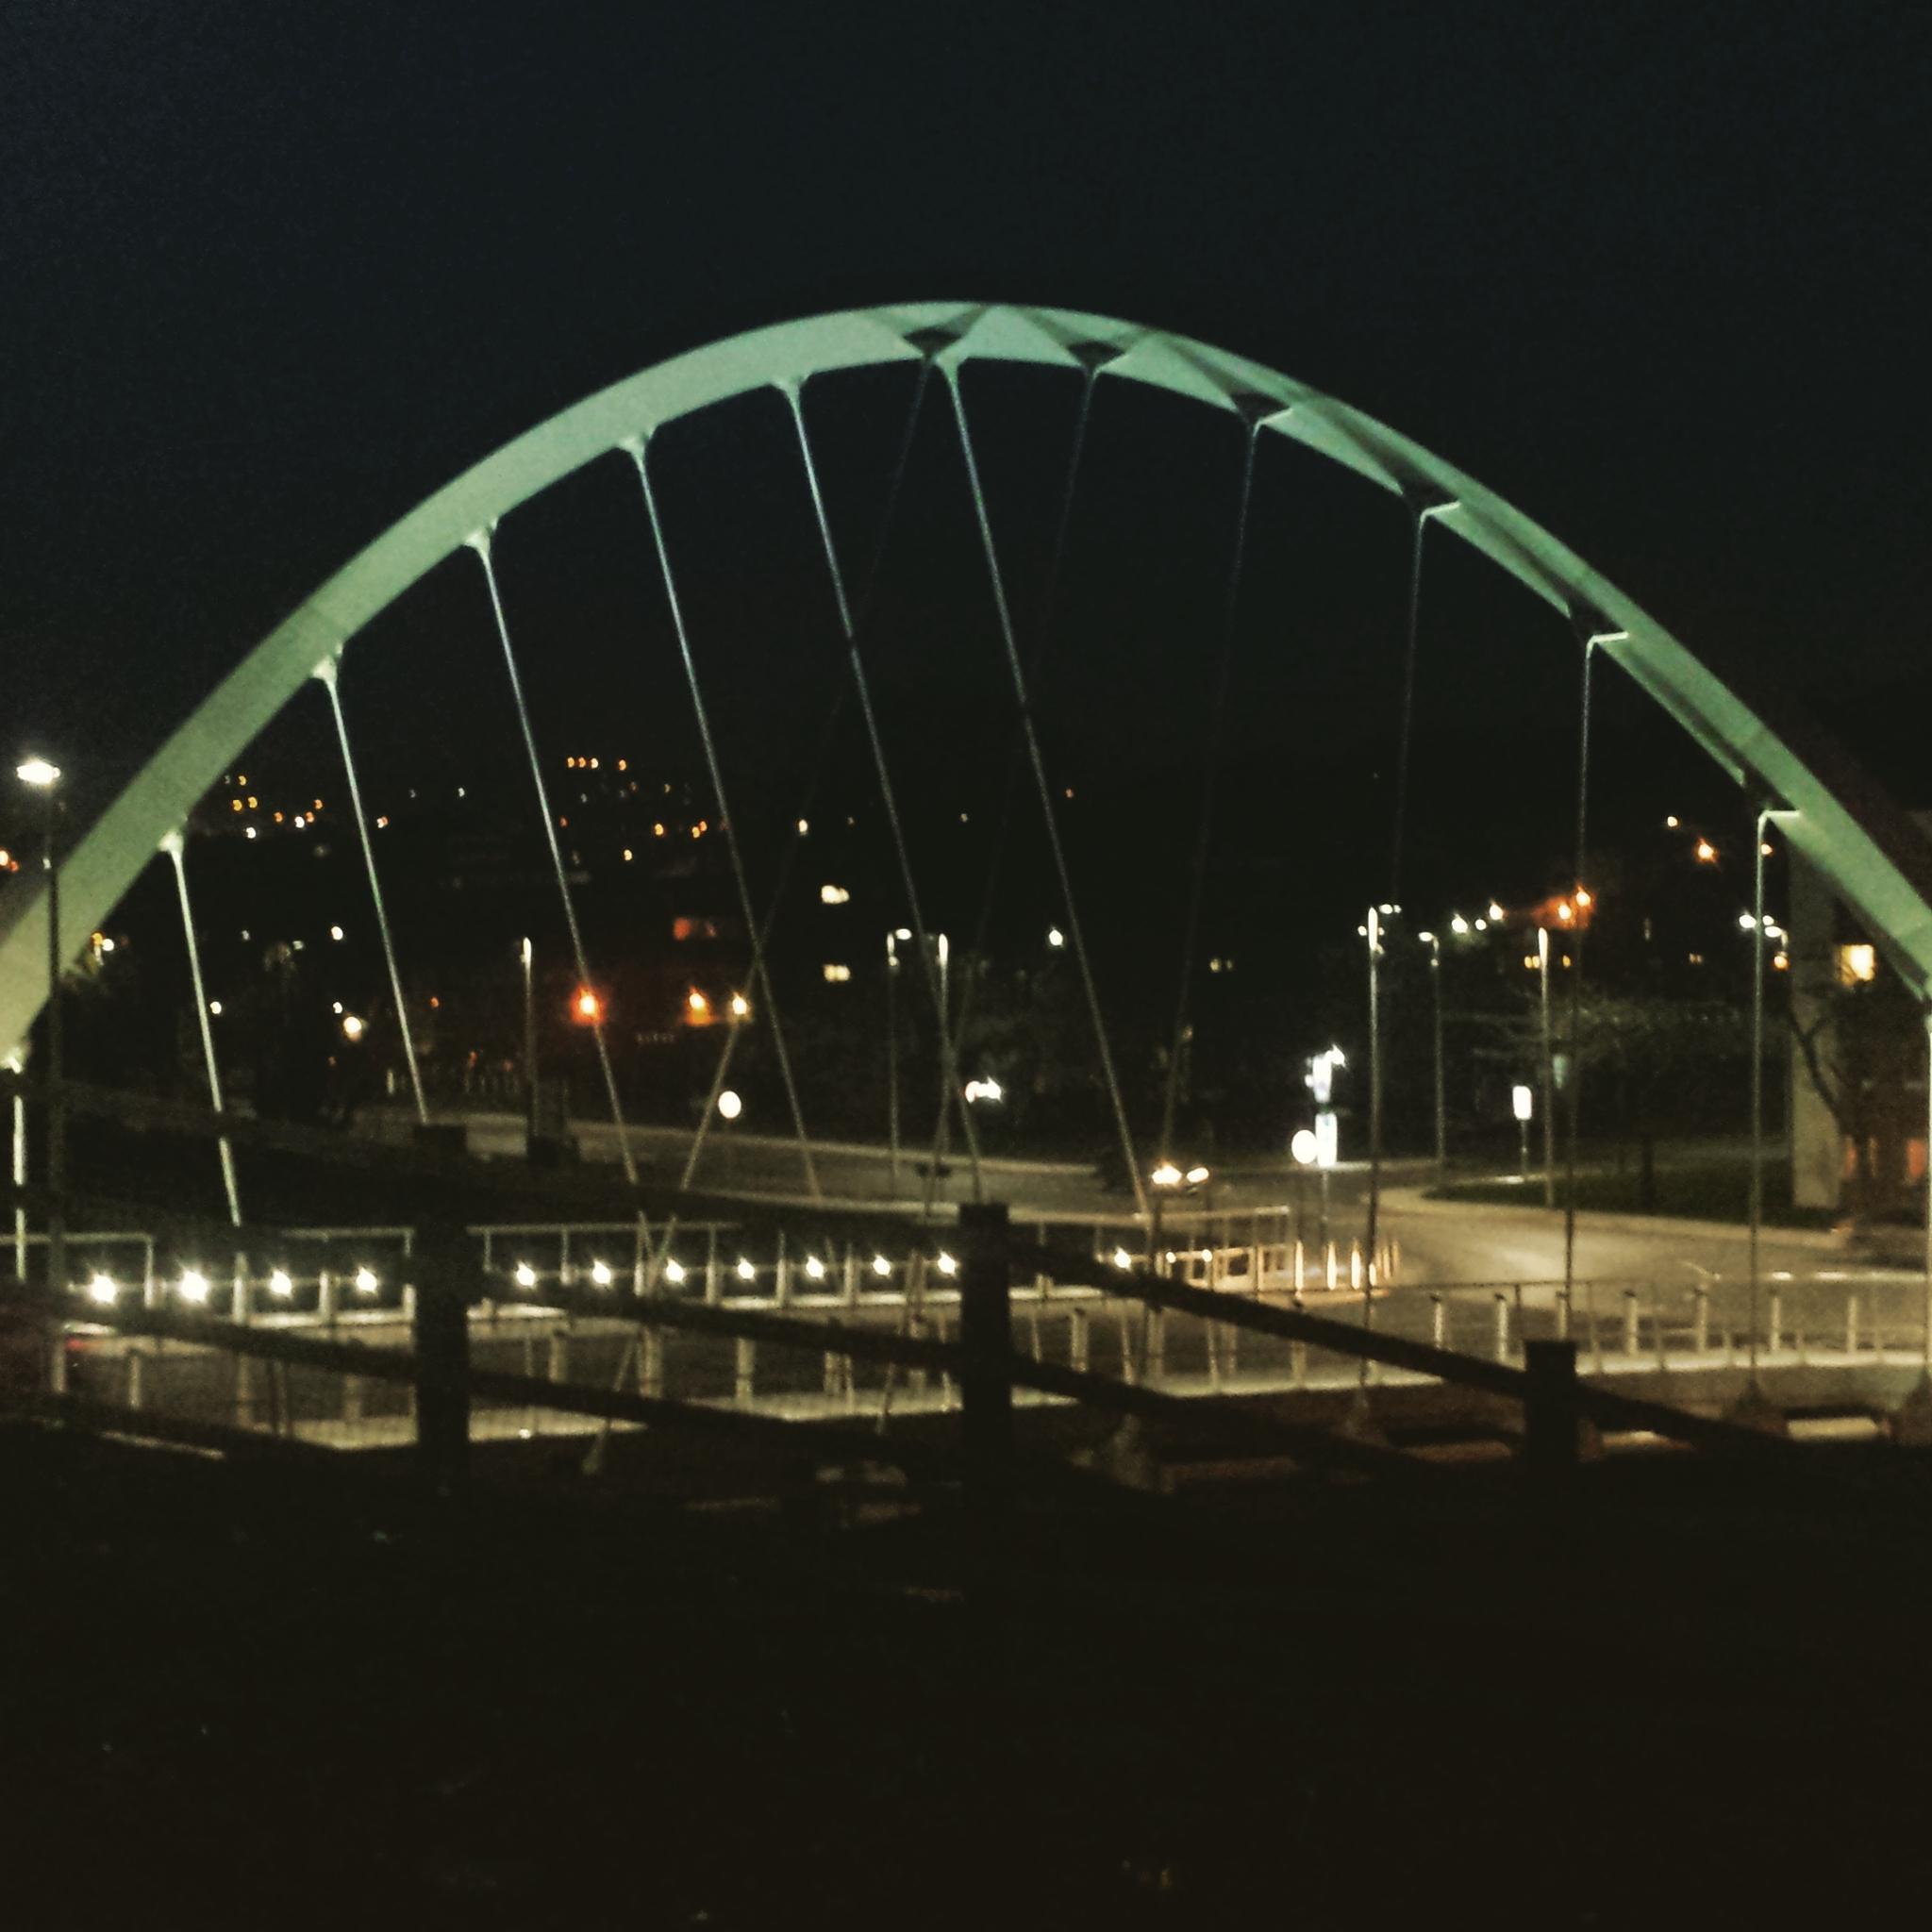 Night view of Bridge by lprice